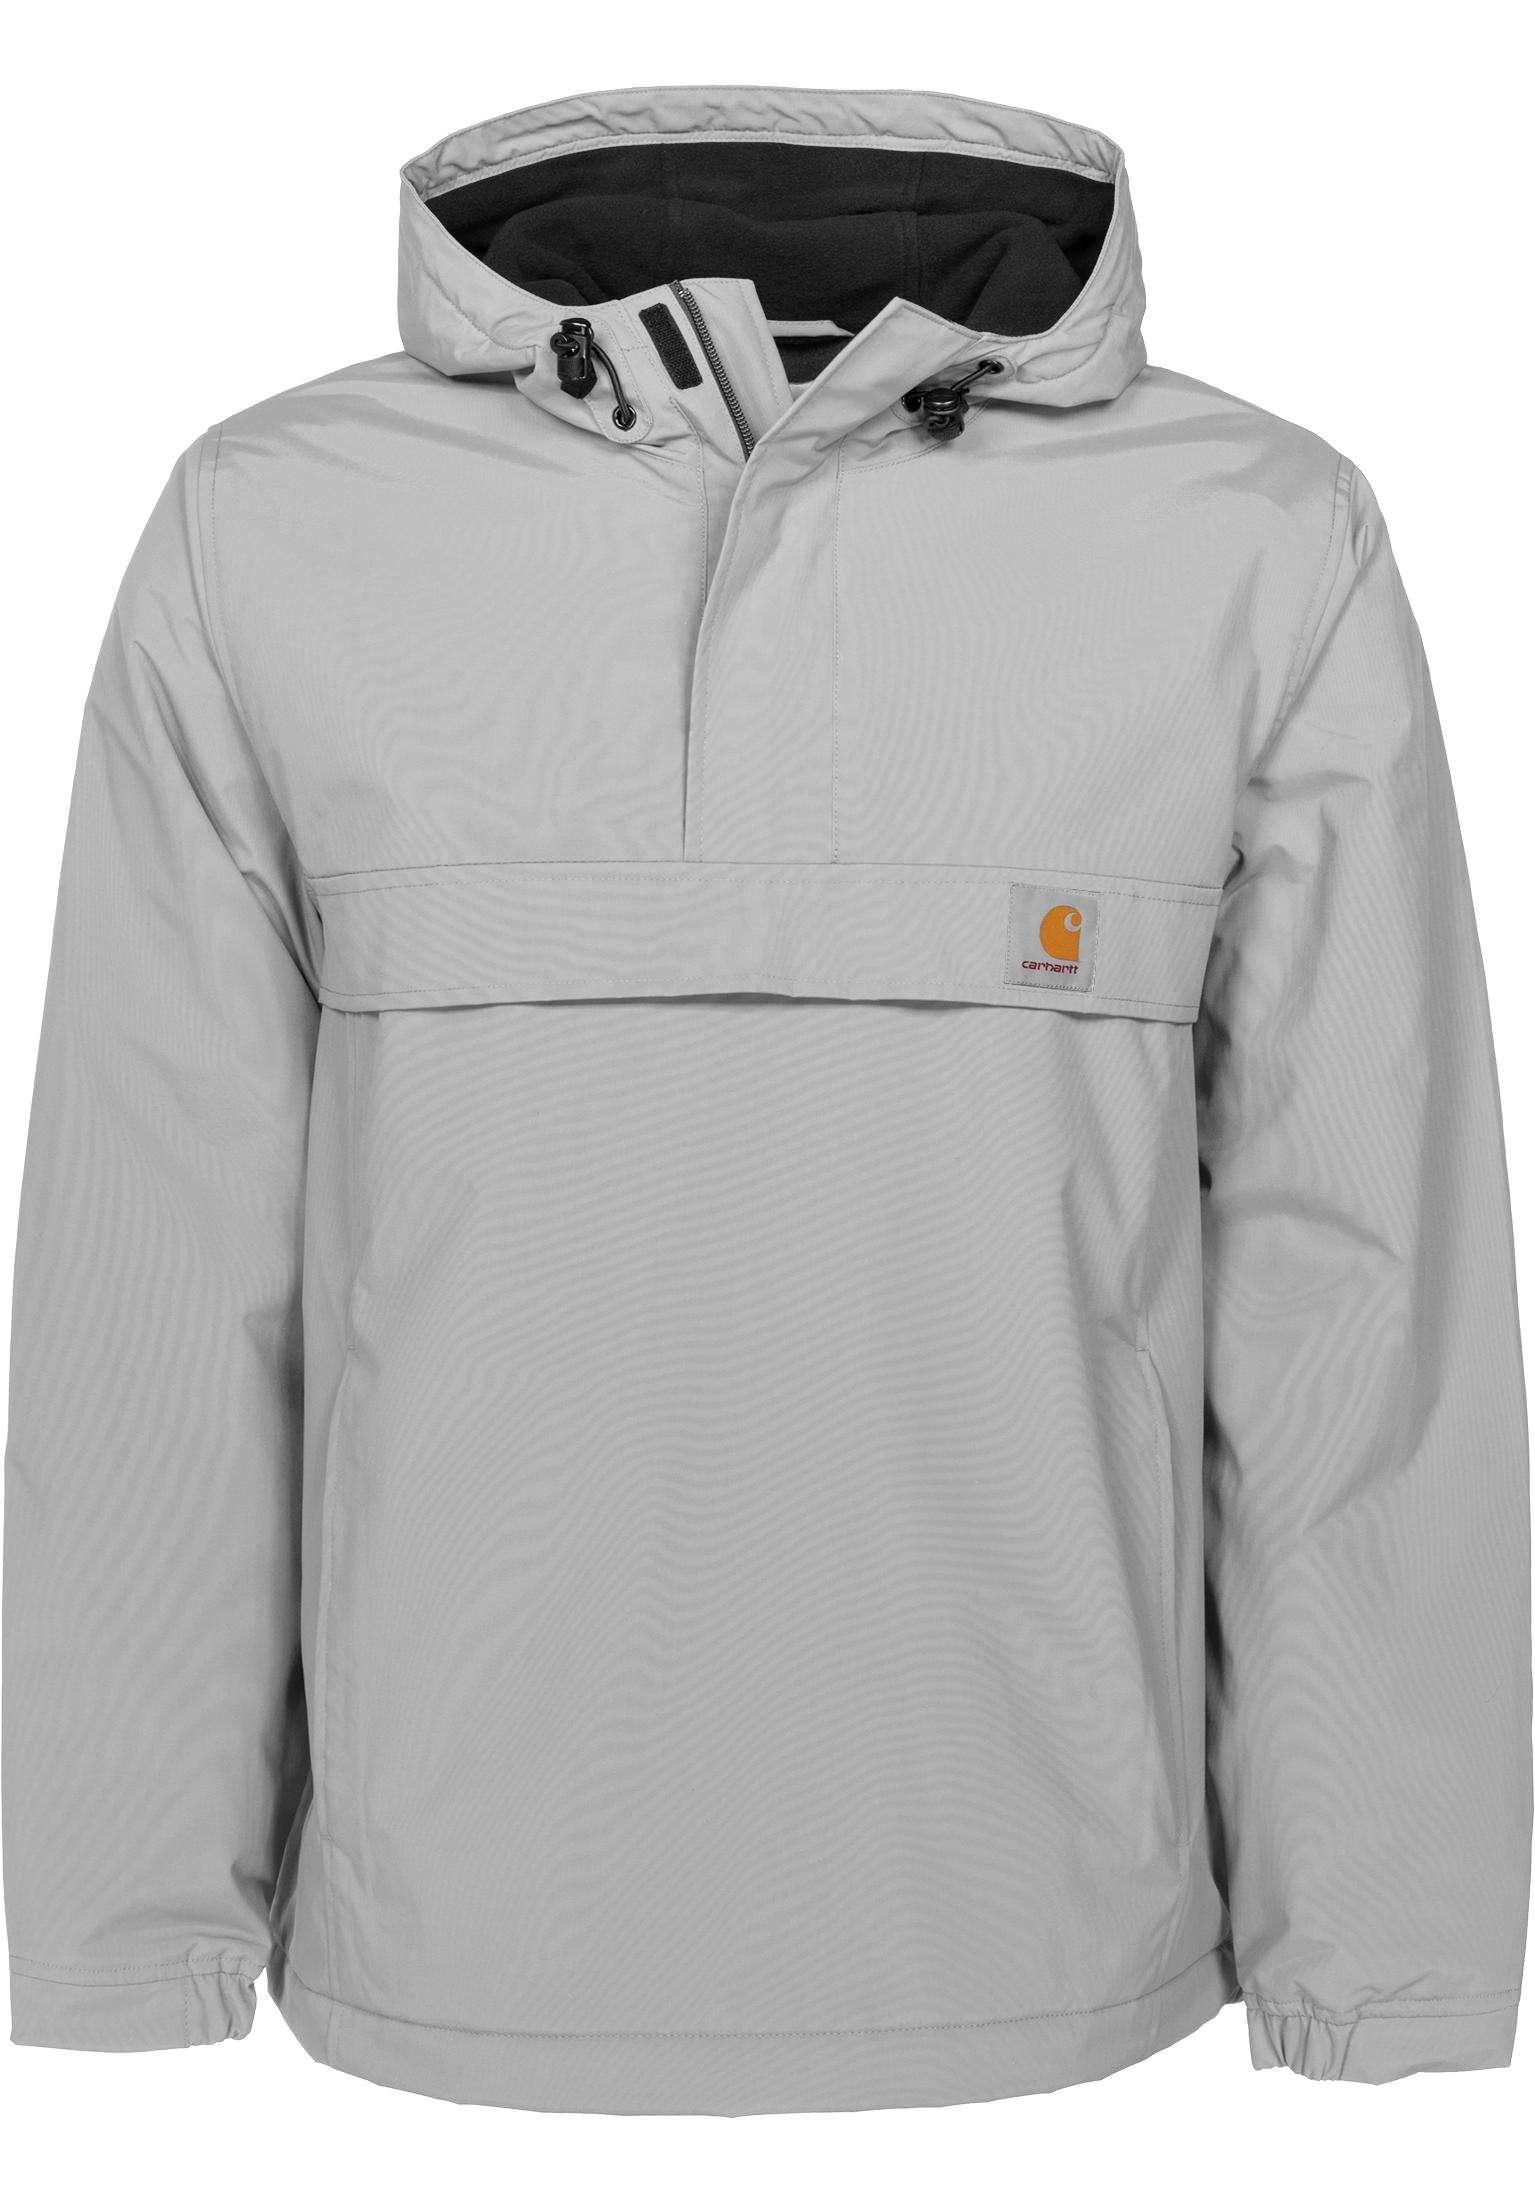 7808905430d8 Nimbus Pullover Winter Carhartt WIP Winter Jackets in cinder for Men ...